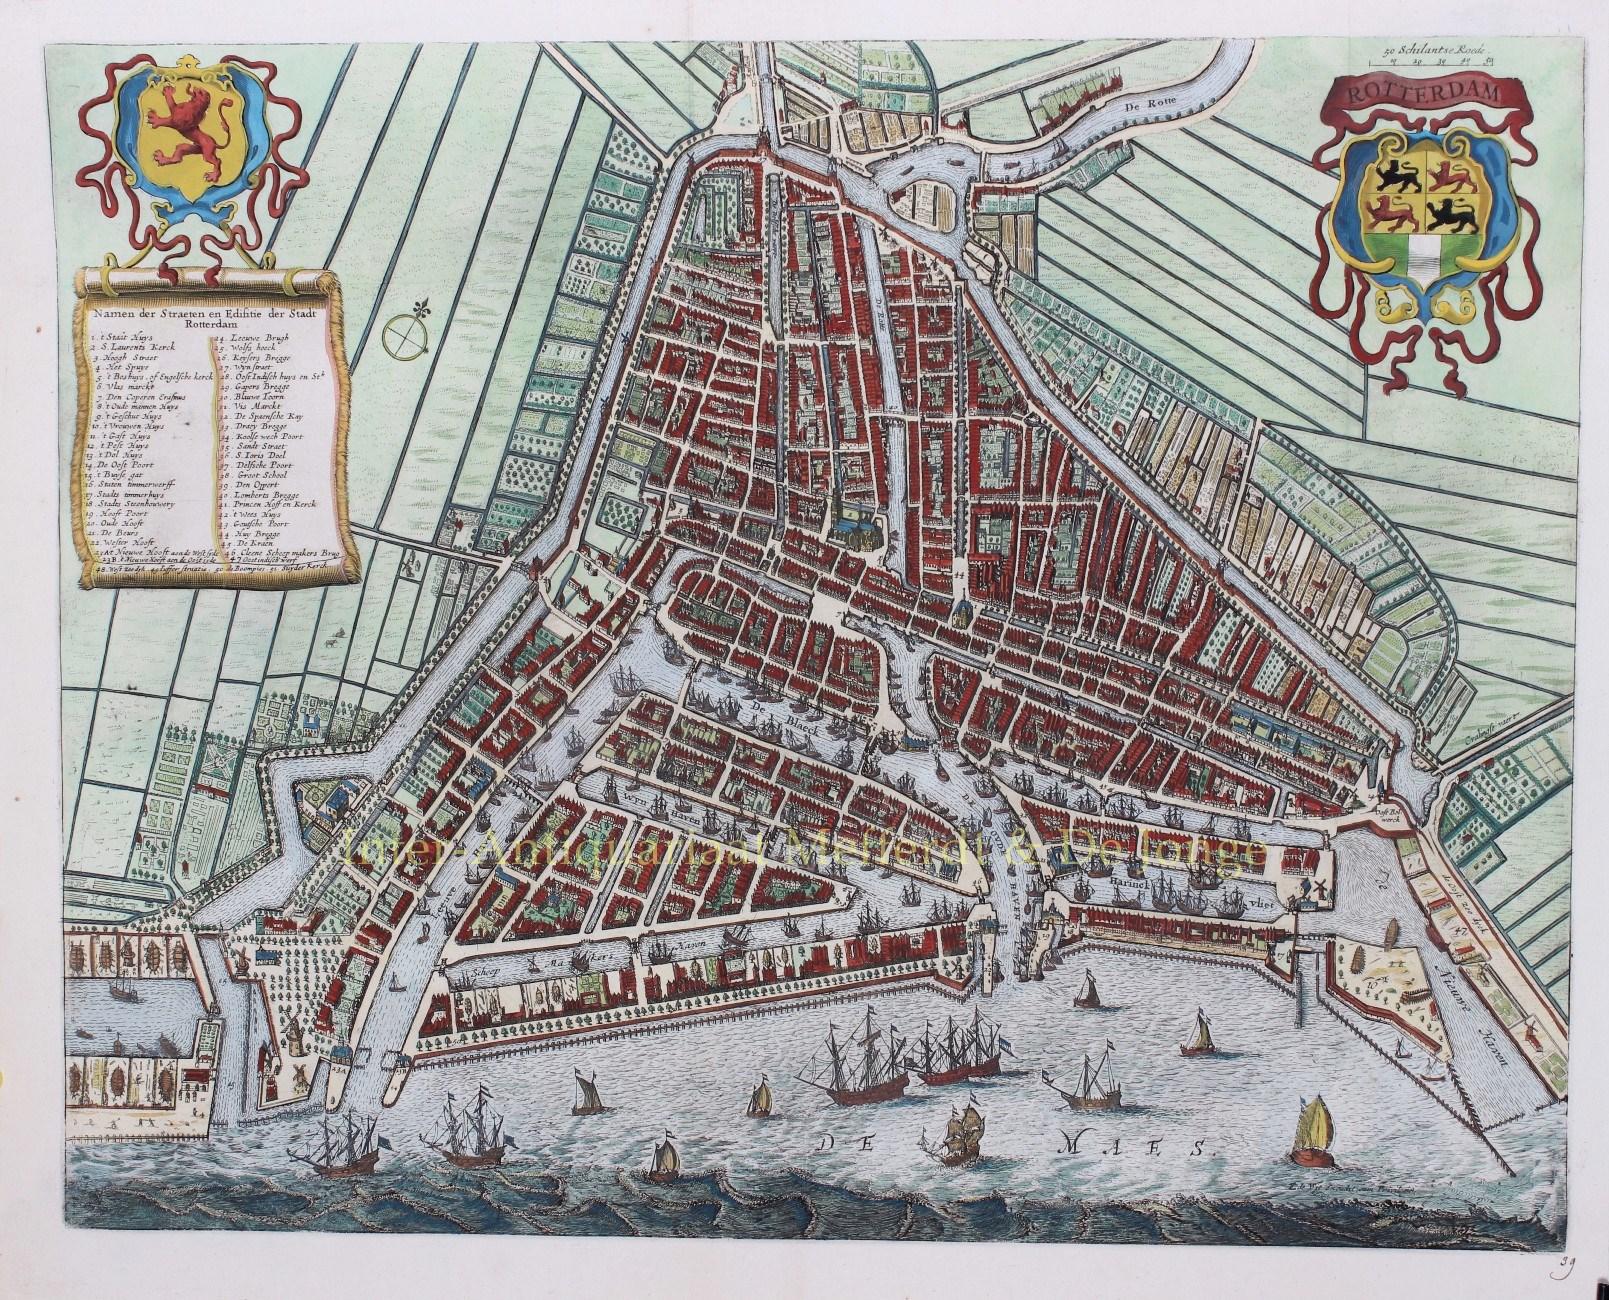 LETI,  GREGORIO (1630-1701) - Rotterdam - Gregorio Leti (Frederick de Wit), 1690